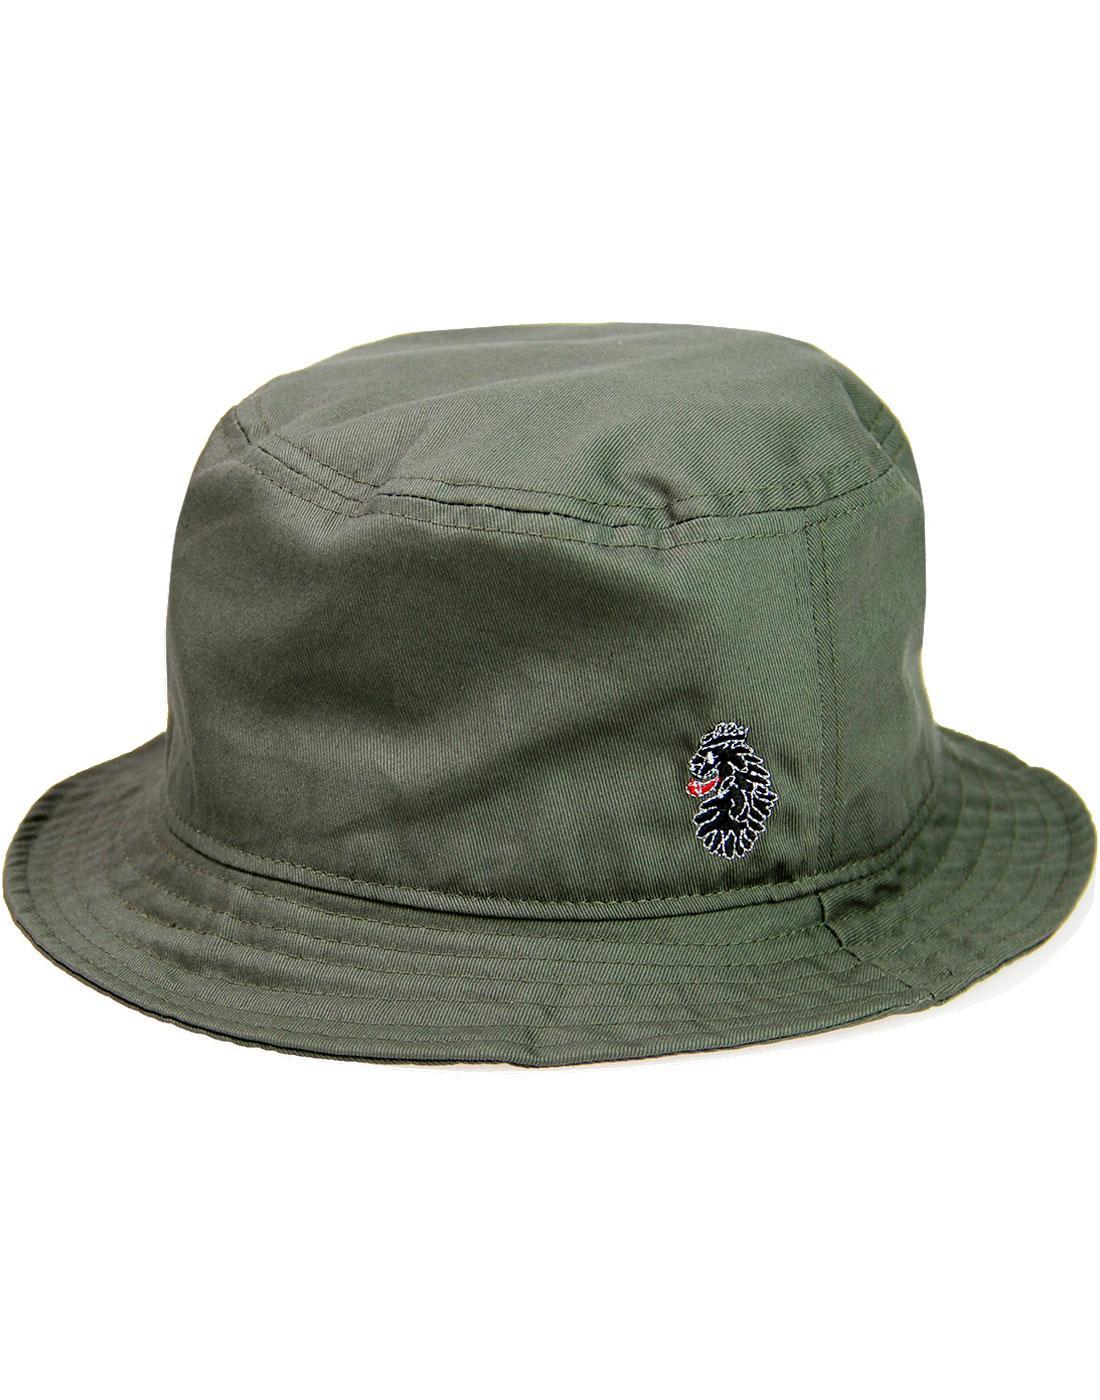 Dayton LUKE Retro Indie Logo Bucket Hat MOSS